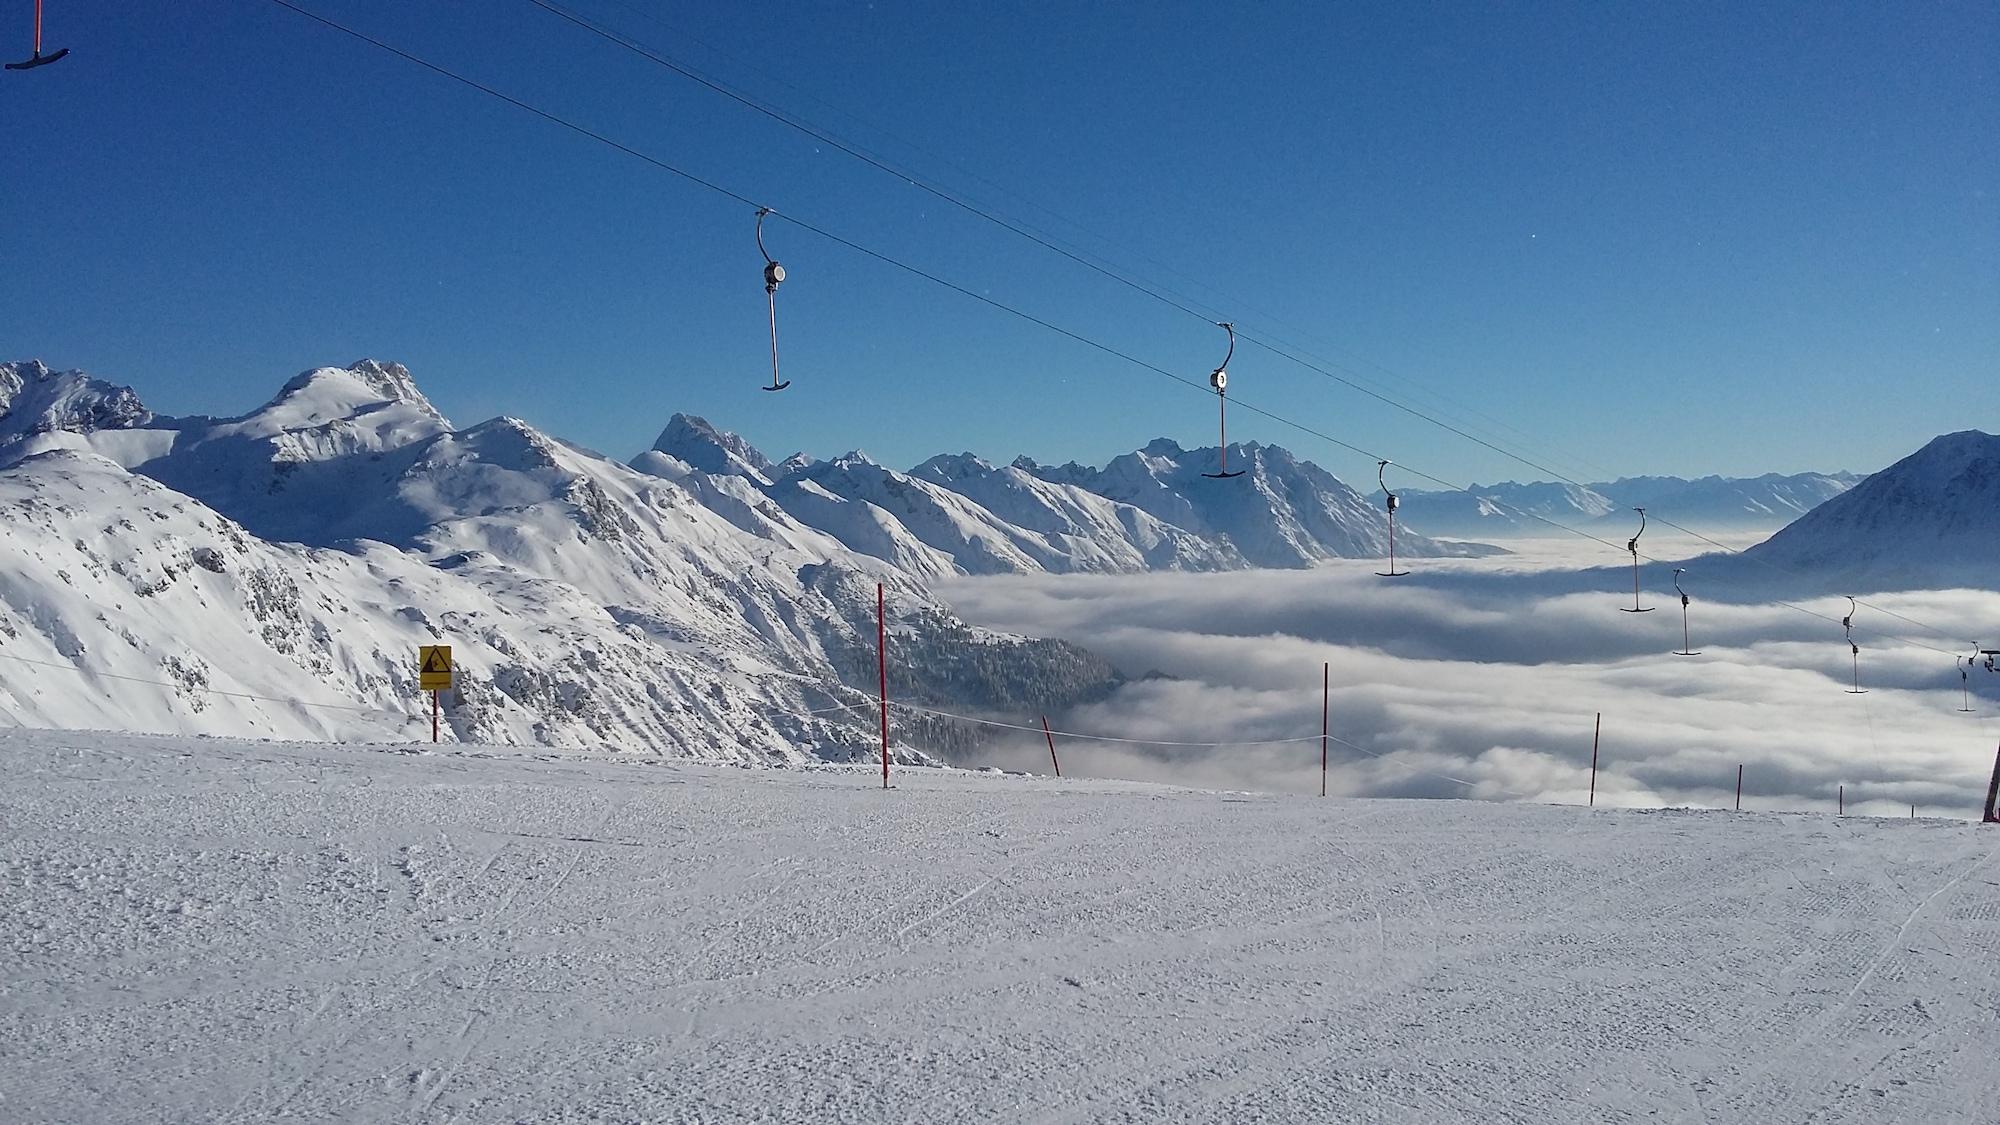 St.anton Skiing Holidays Piste View